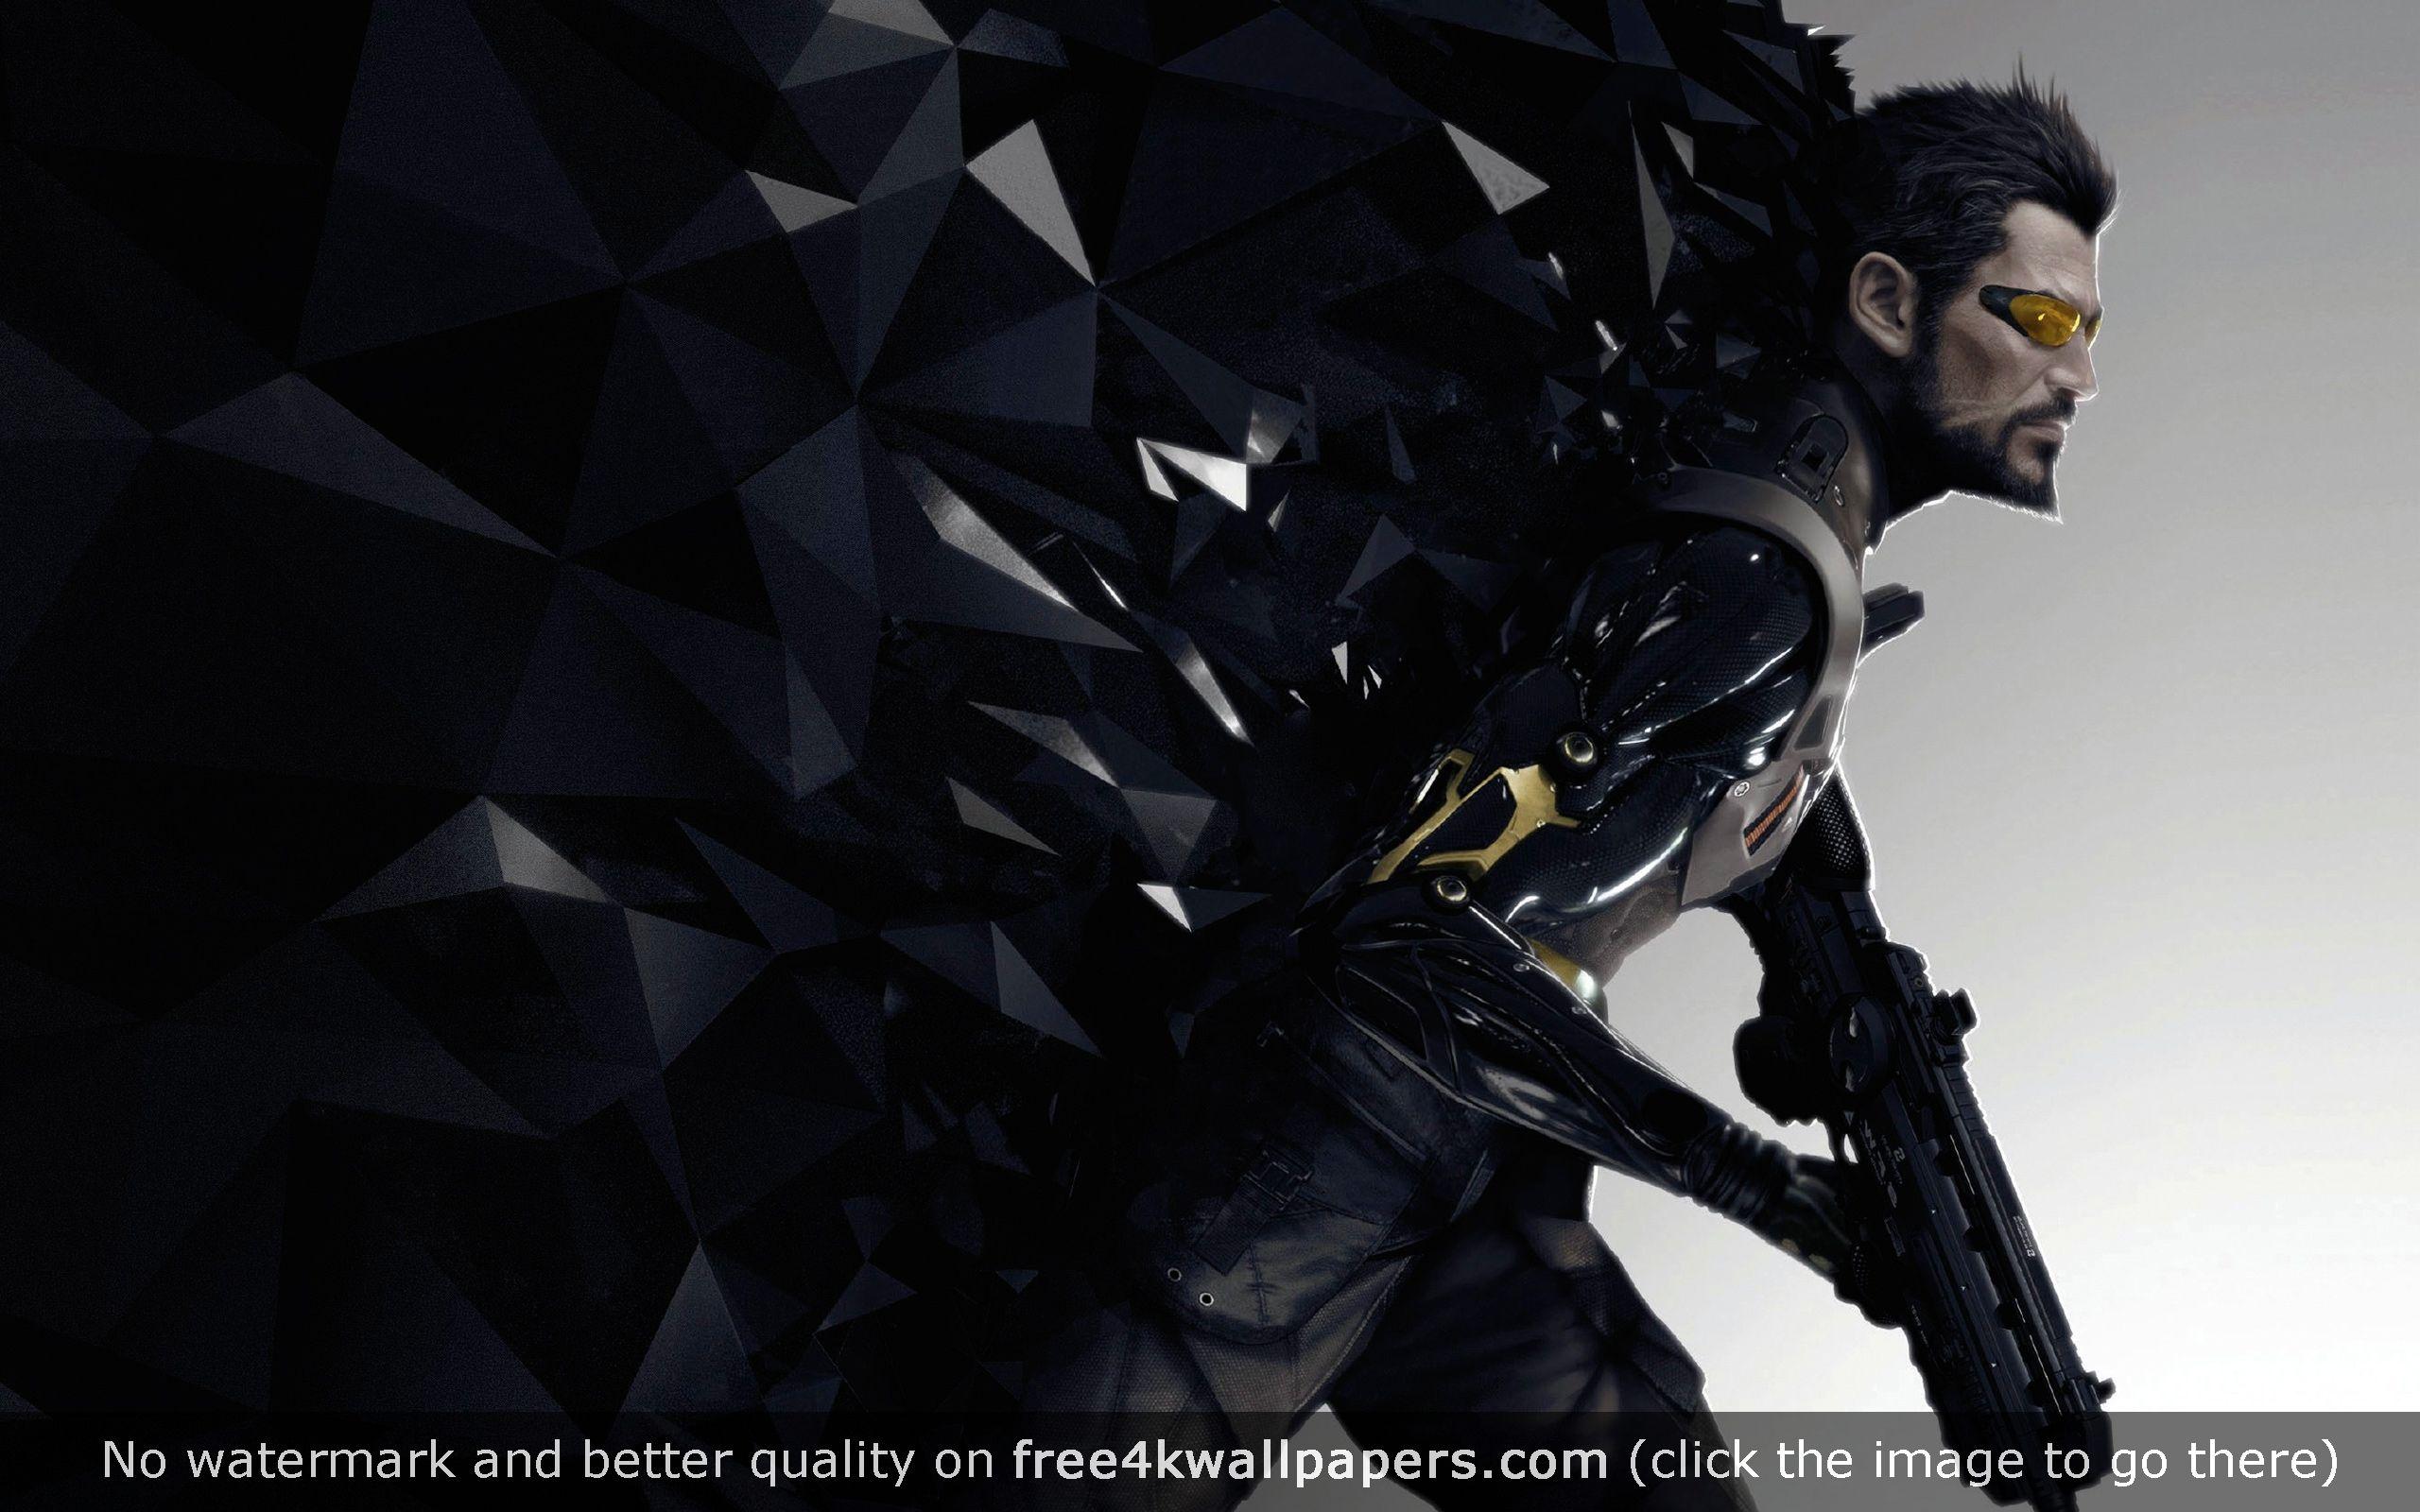 Deus Ex Mankind Divided 2016 Hd Wallpaper Deus Ex Mankind Divided Deus Ex Mankind Deus Ex